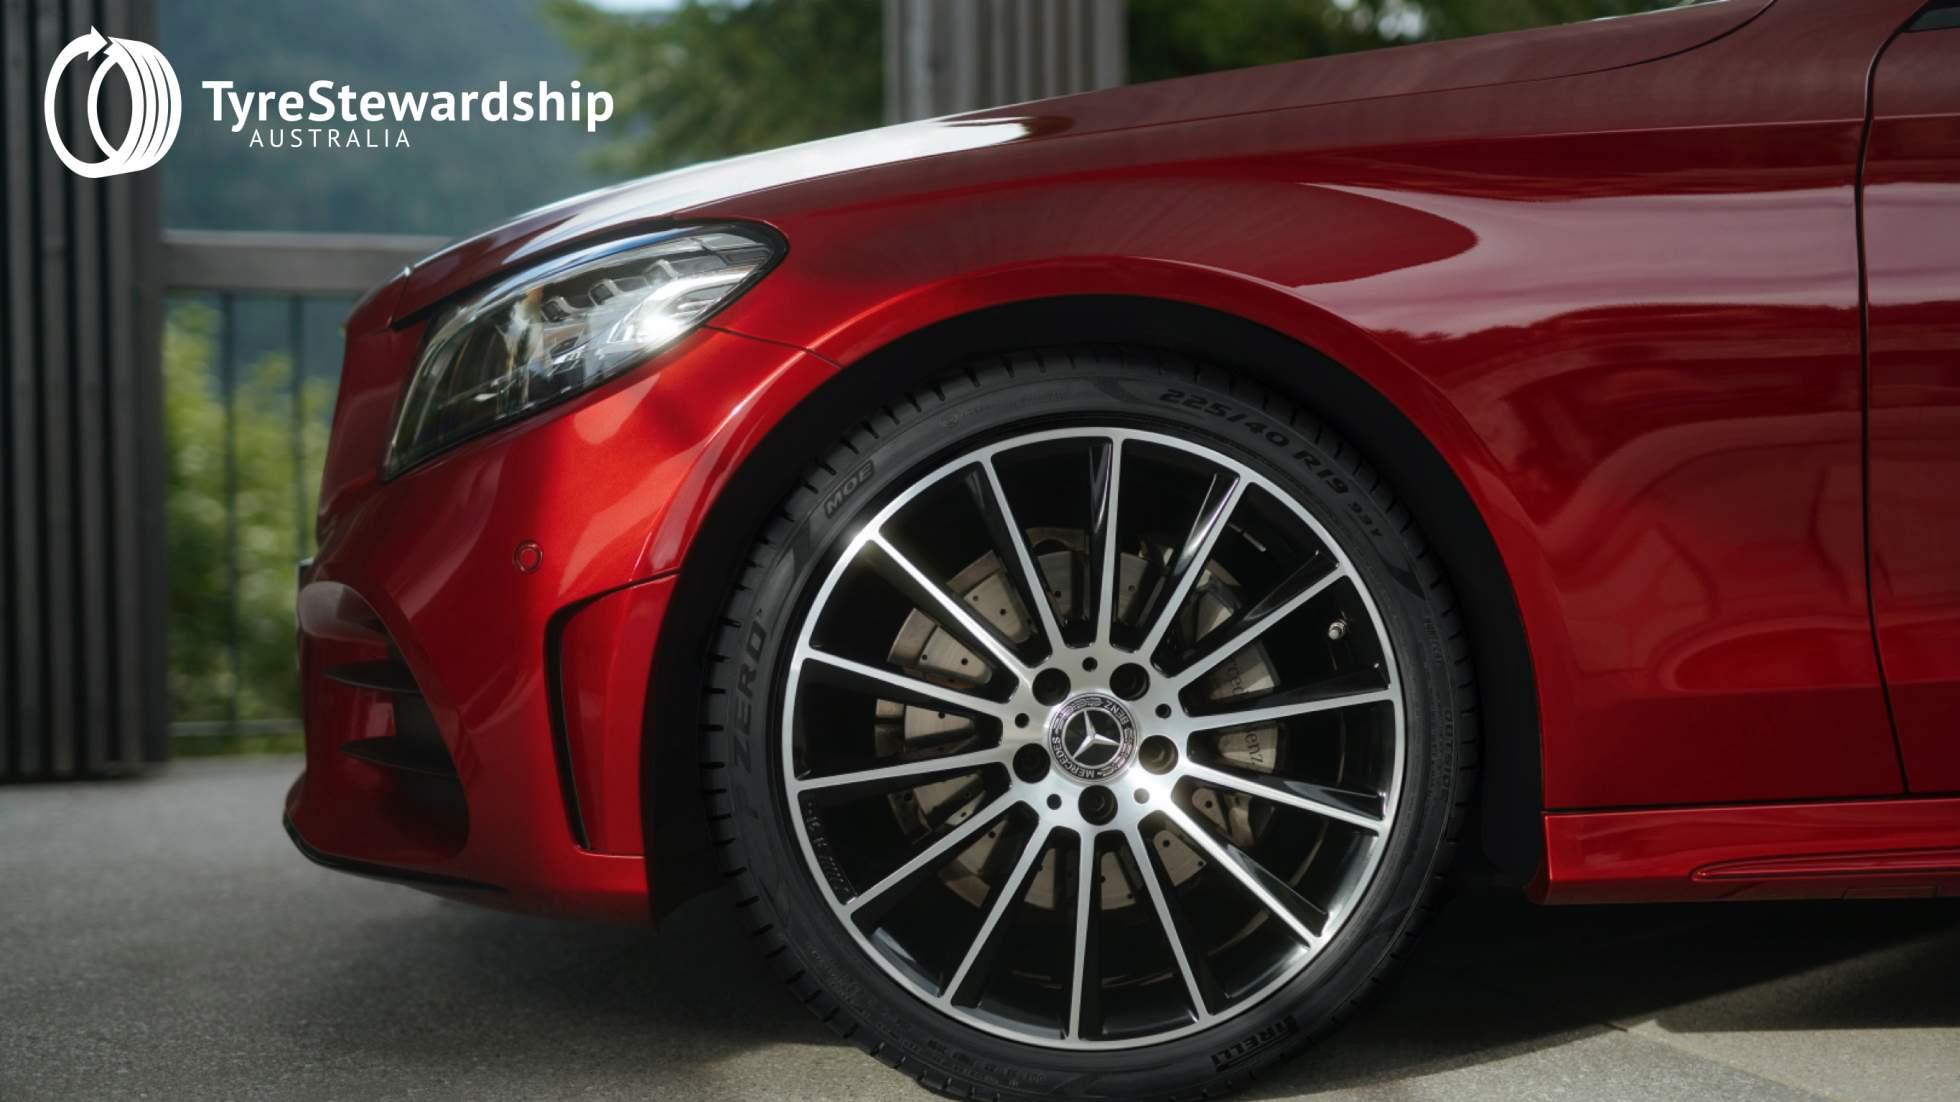 Tyre Stewardship Australia welcomes Mercedes-Benz Australia